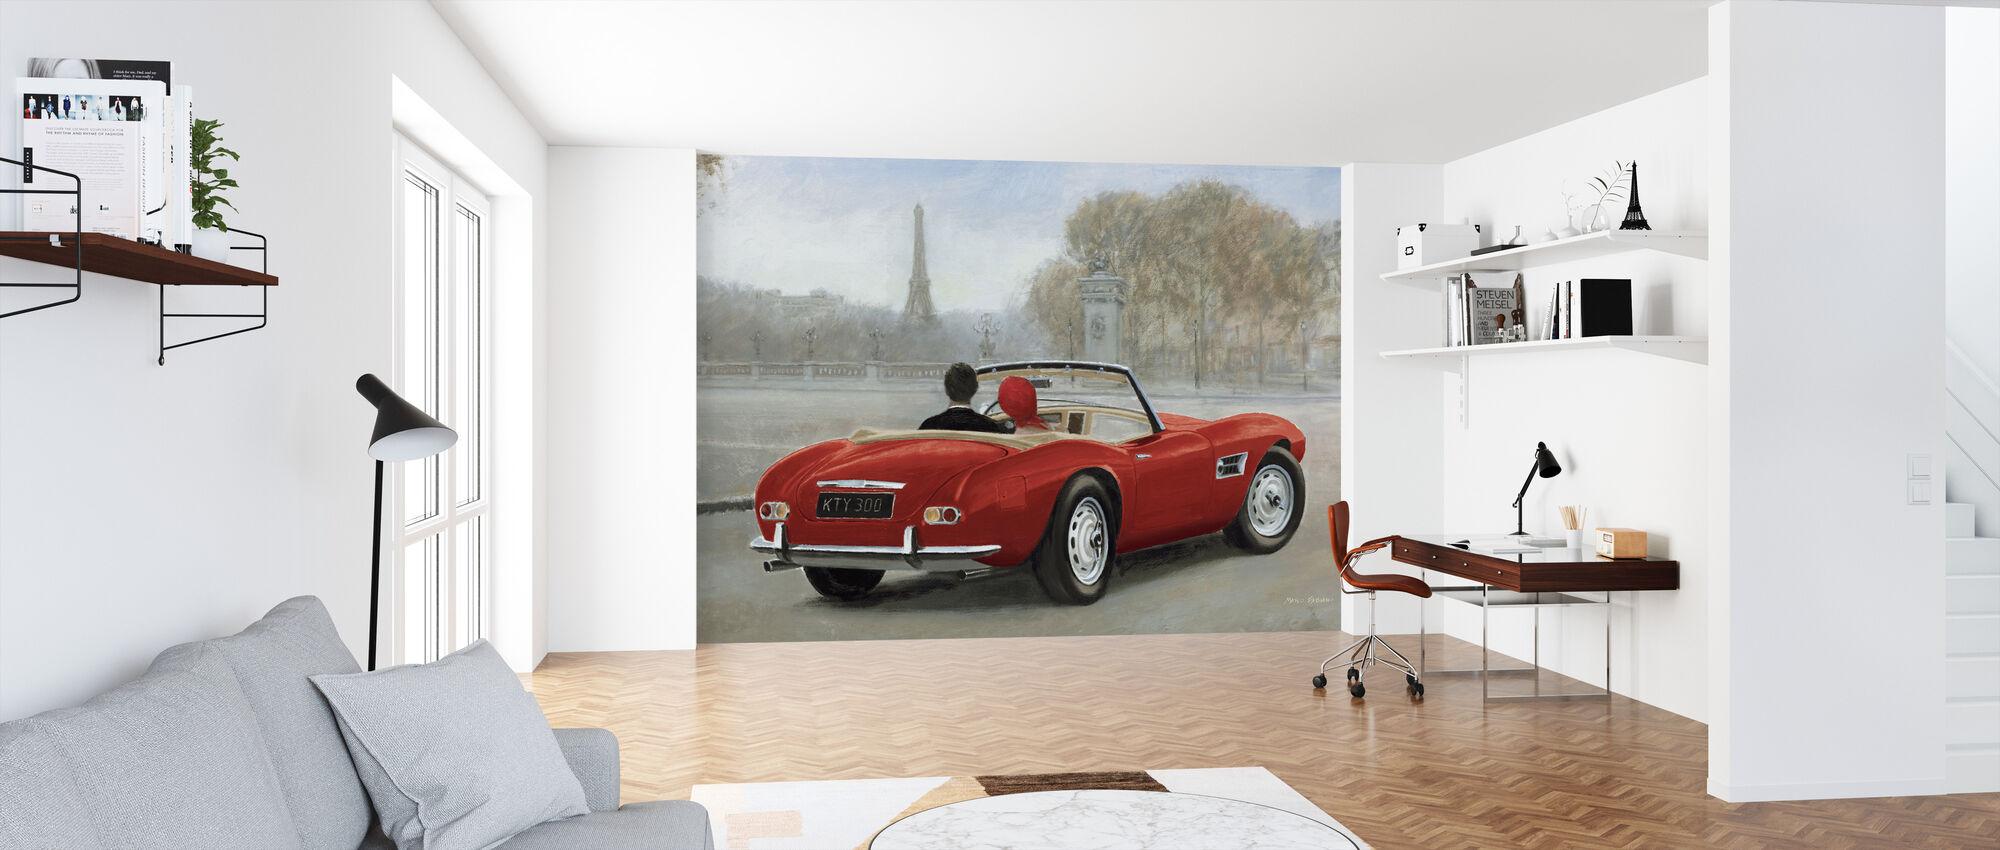 A ride in Paris III Red Car - Wallpaper - Office